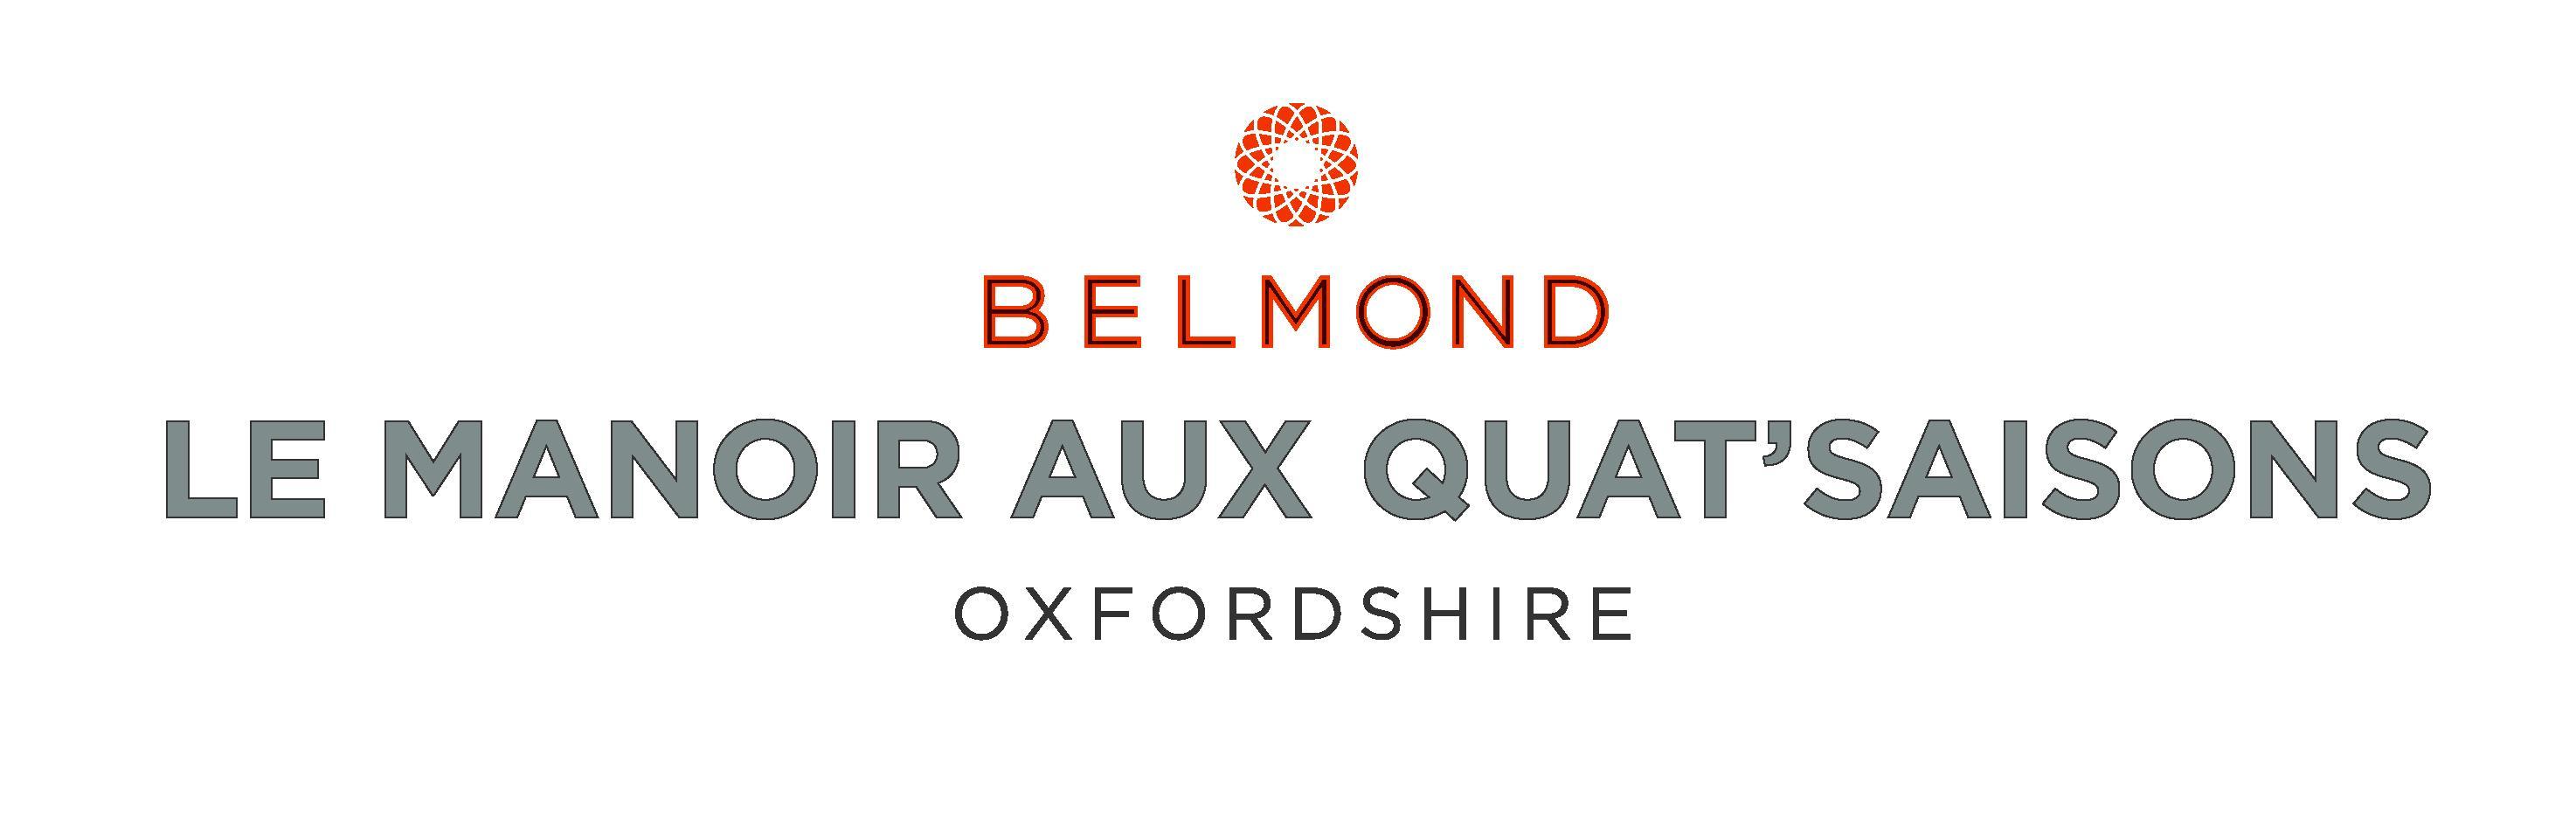 belmond hotel oxfordshire logo